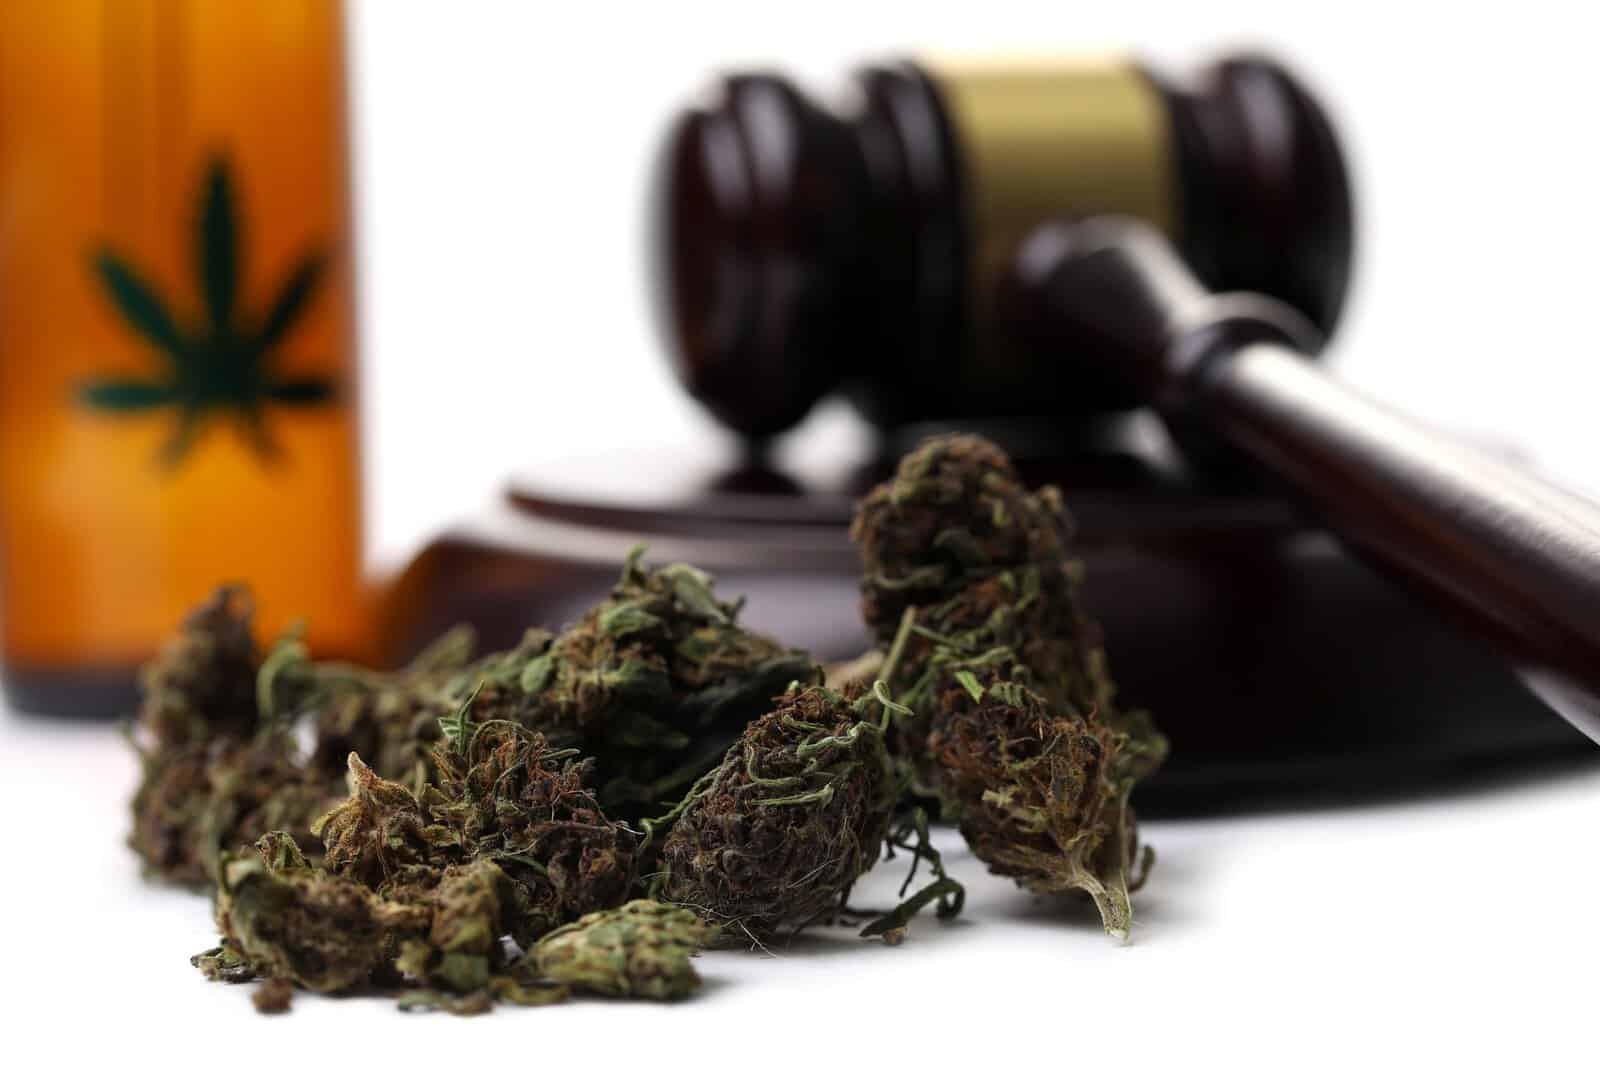 The Real Reason People Think Marijuana Use is Illegal